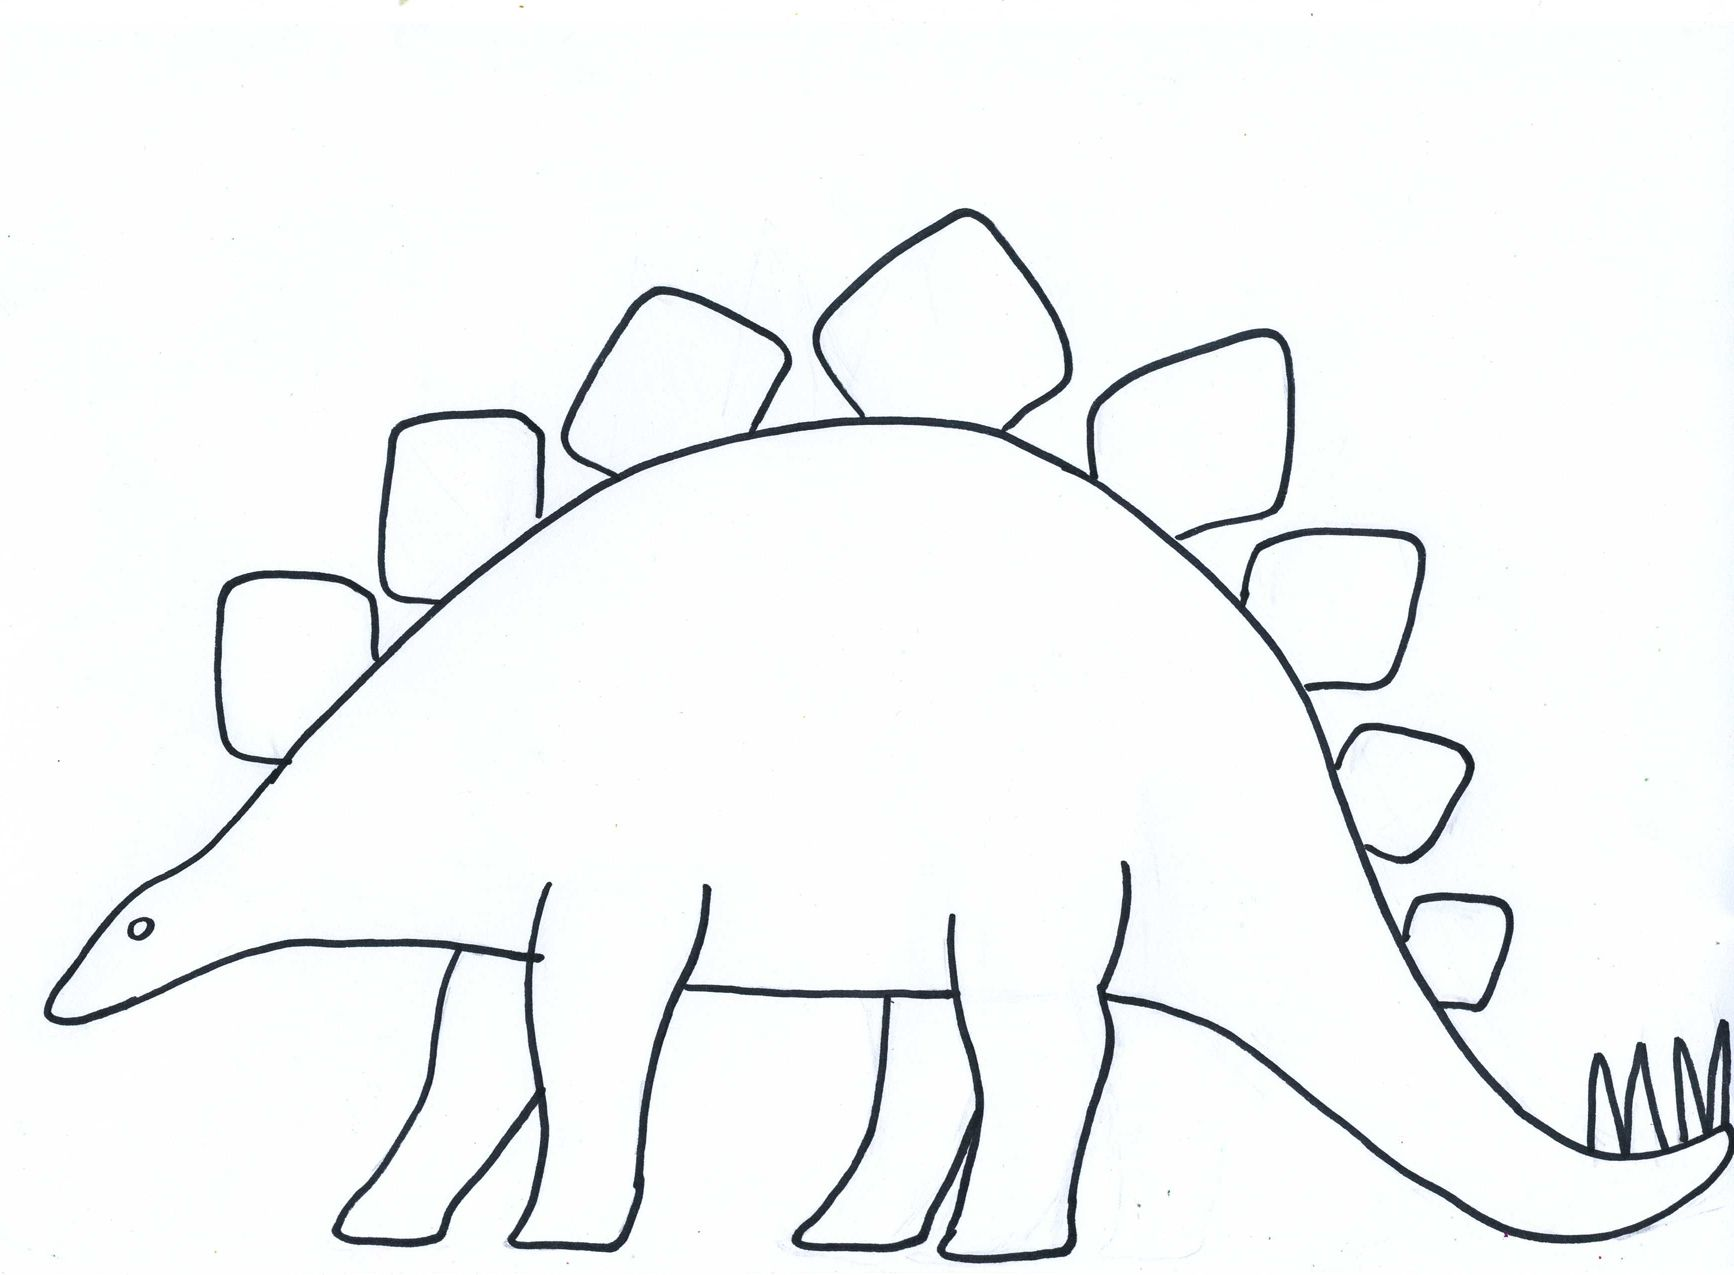 Paper Crafts For Children Decorating Dinosaur Shapes